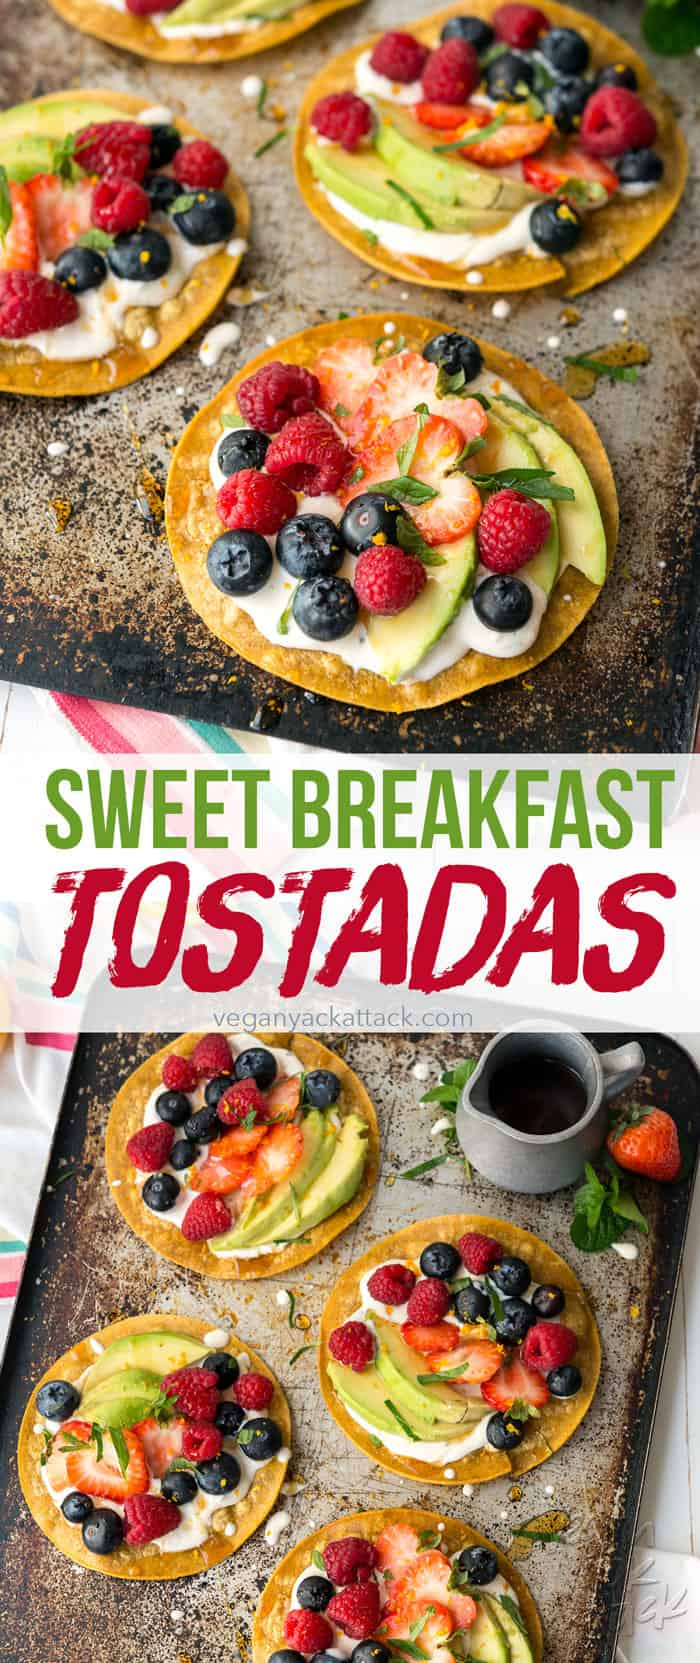 Sweet Breakfast Tostadas - A simple, delicious, breakfast snack! Vegan, Gluten-free, Soy-free - veganyackattack.com